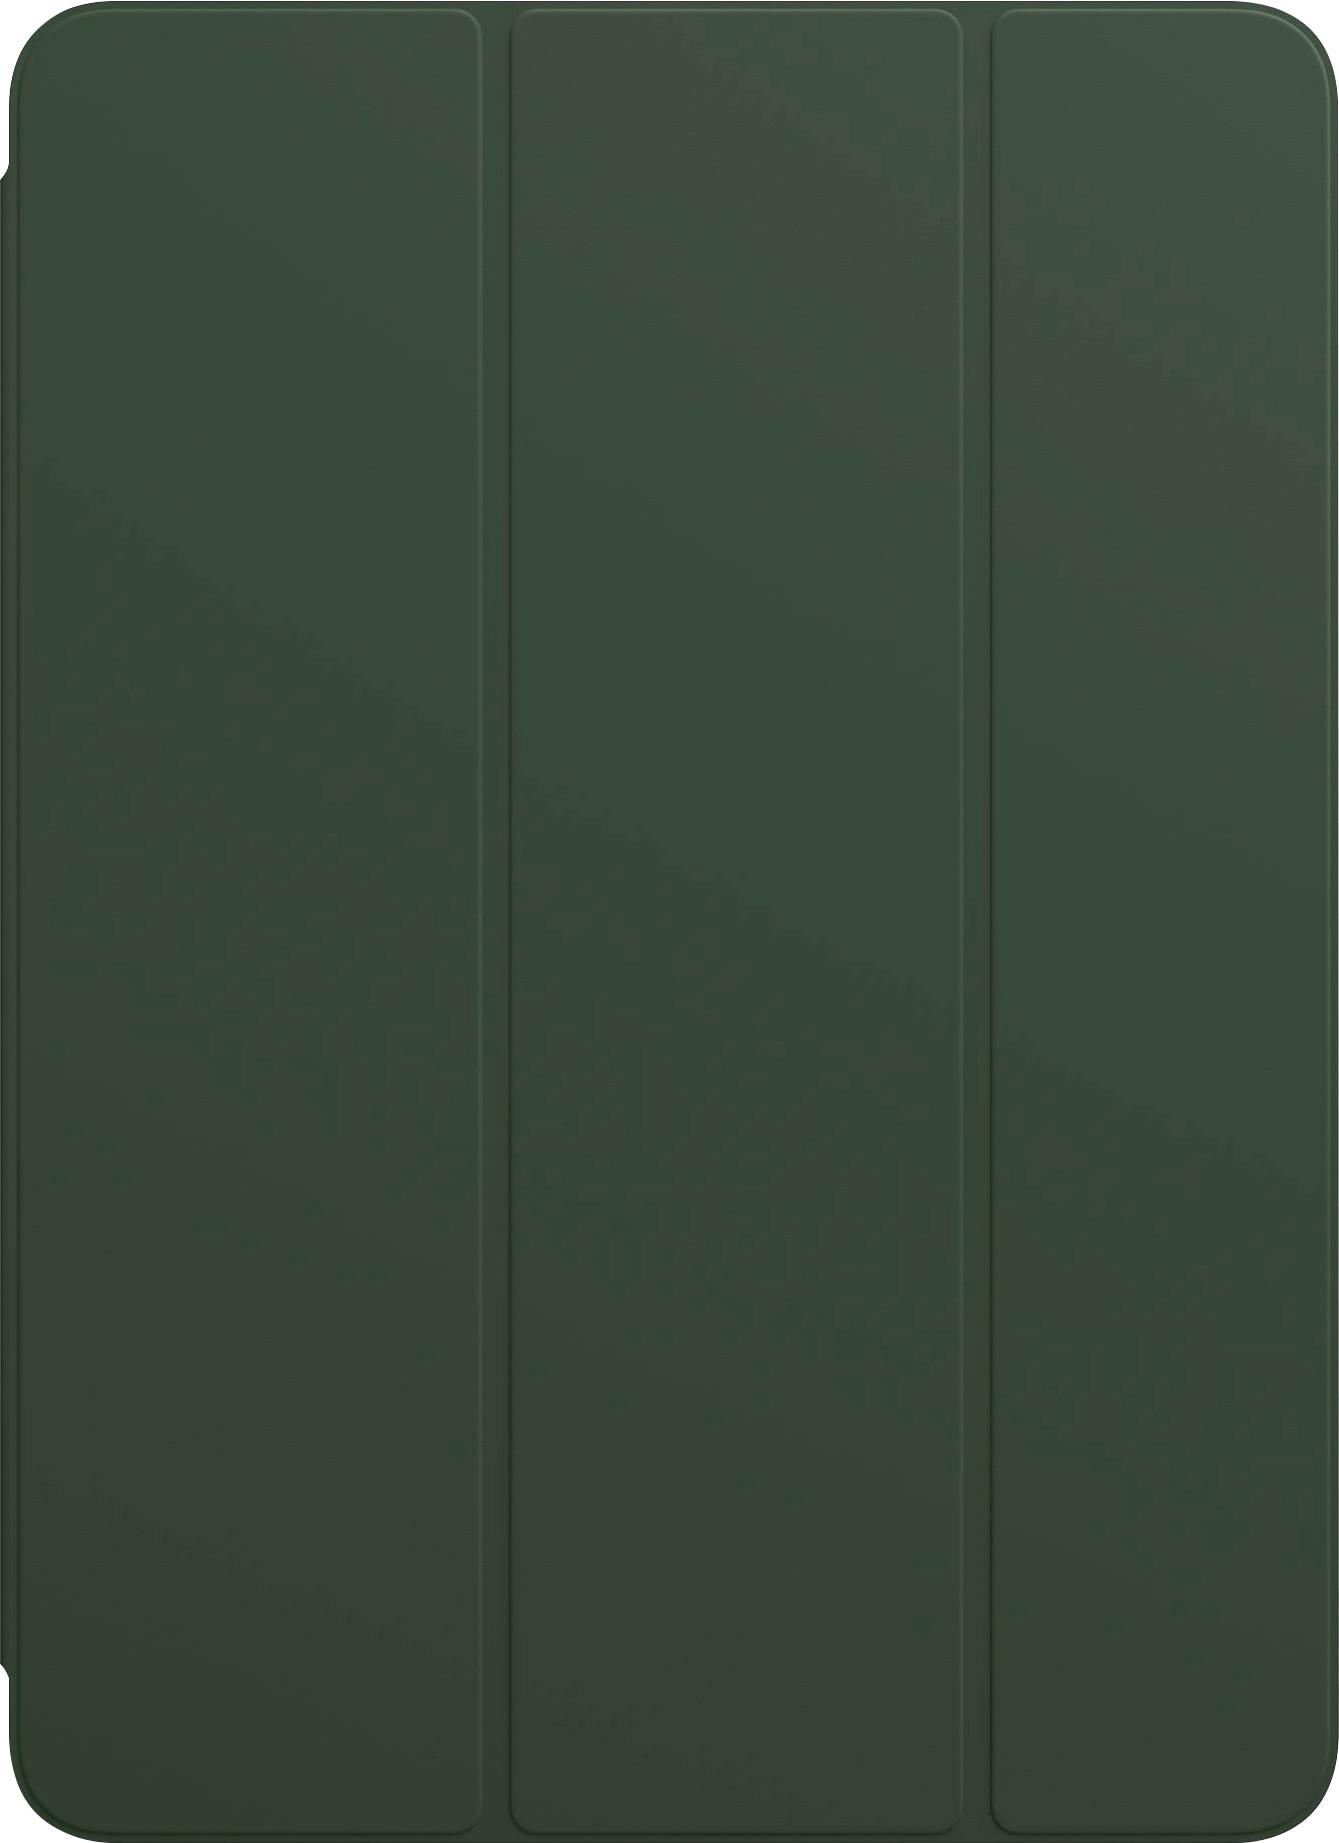 Apple Tablet-Hülle Smart Folio , iPad Pro 11 , 27,9 cm 11 Zoll